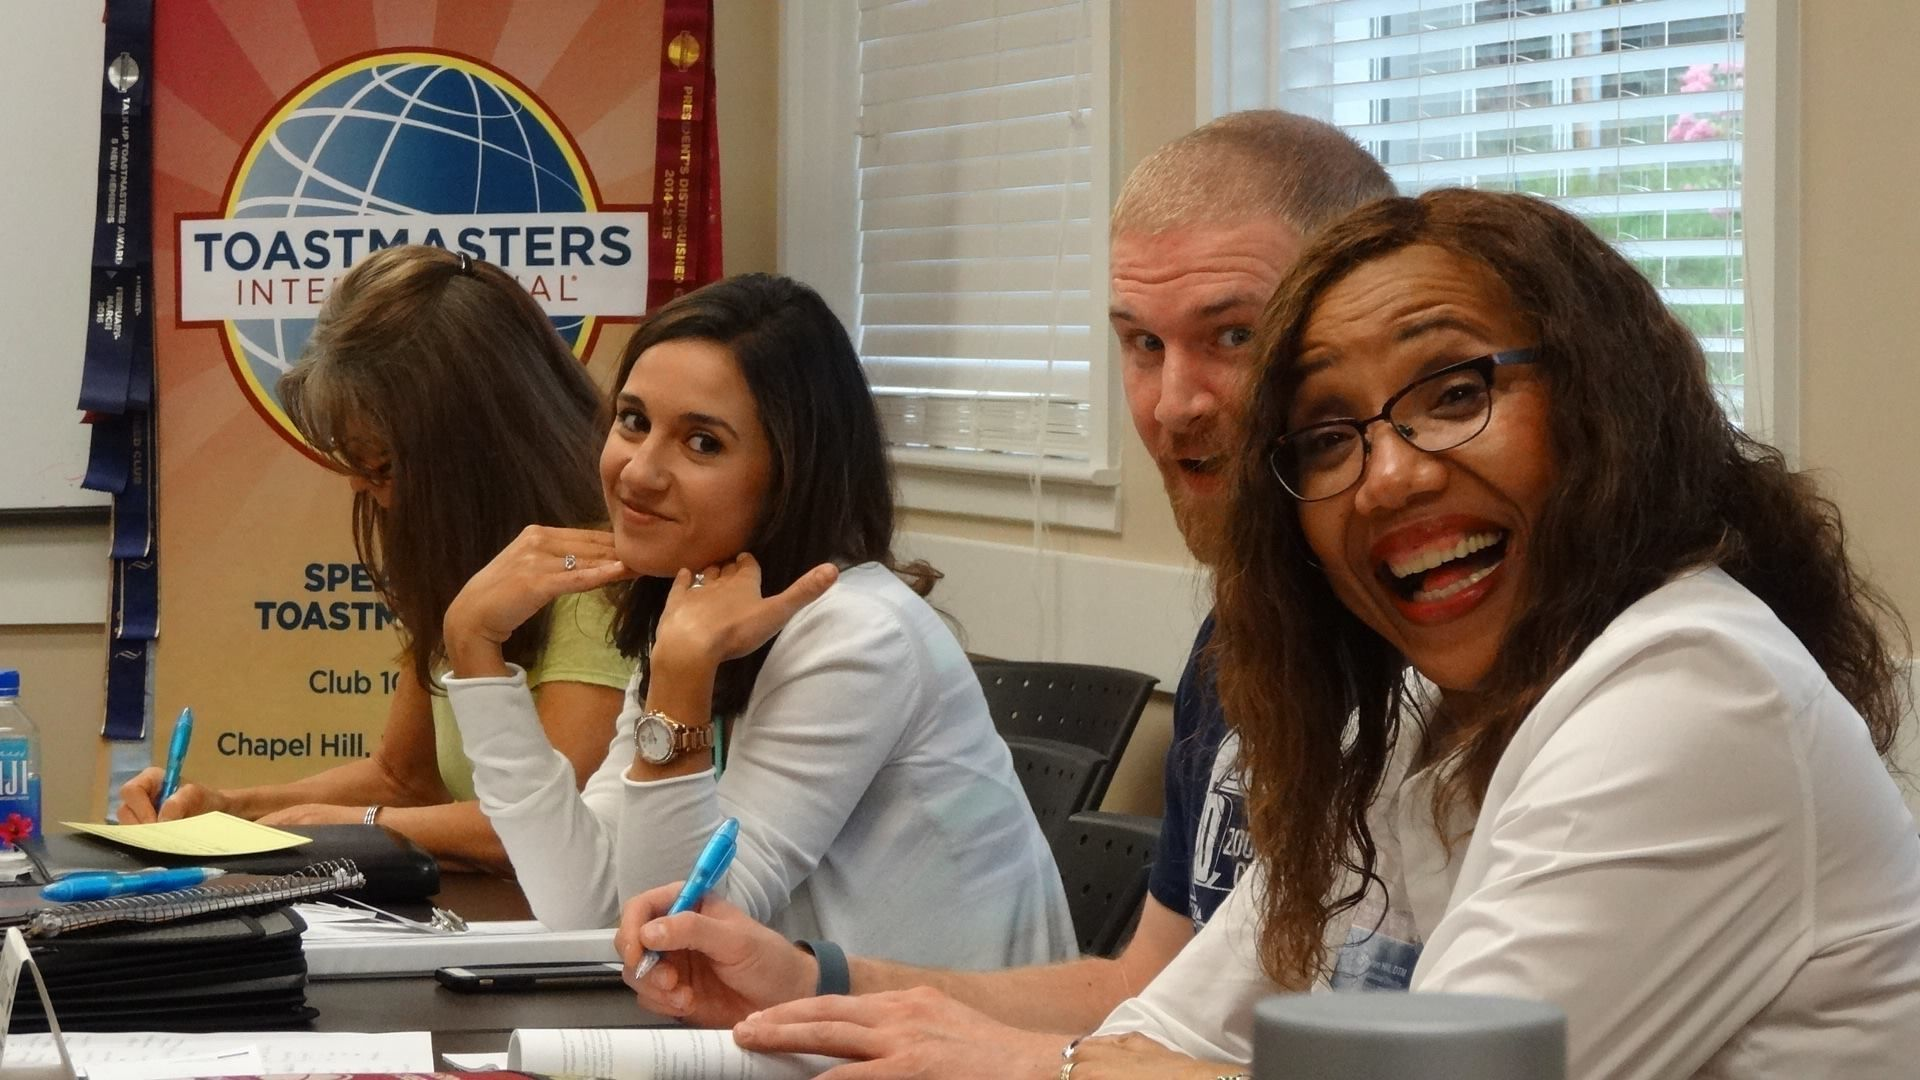 Speak Up! Toastmasters - Public Speaking & Leadership